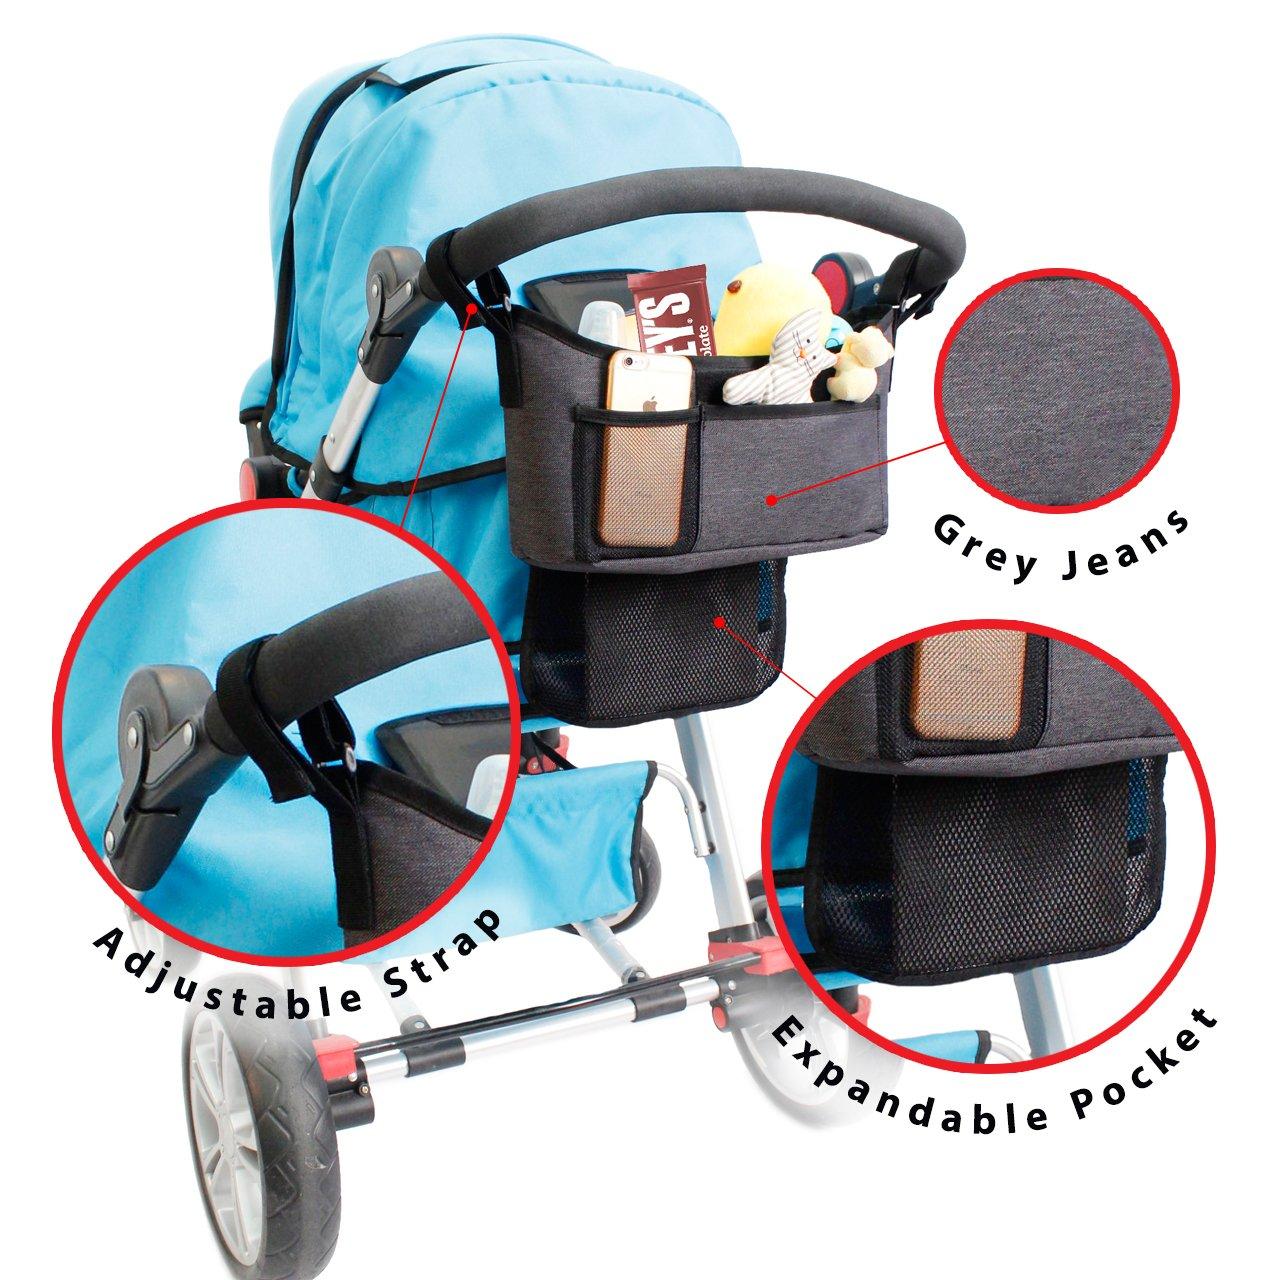 Amazon.com : Stroller Organizer - Universal fit with Adjustable ...